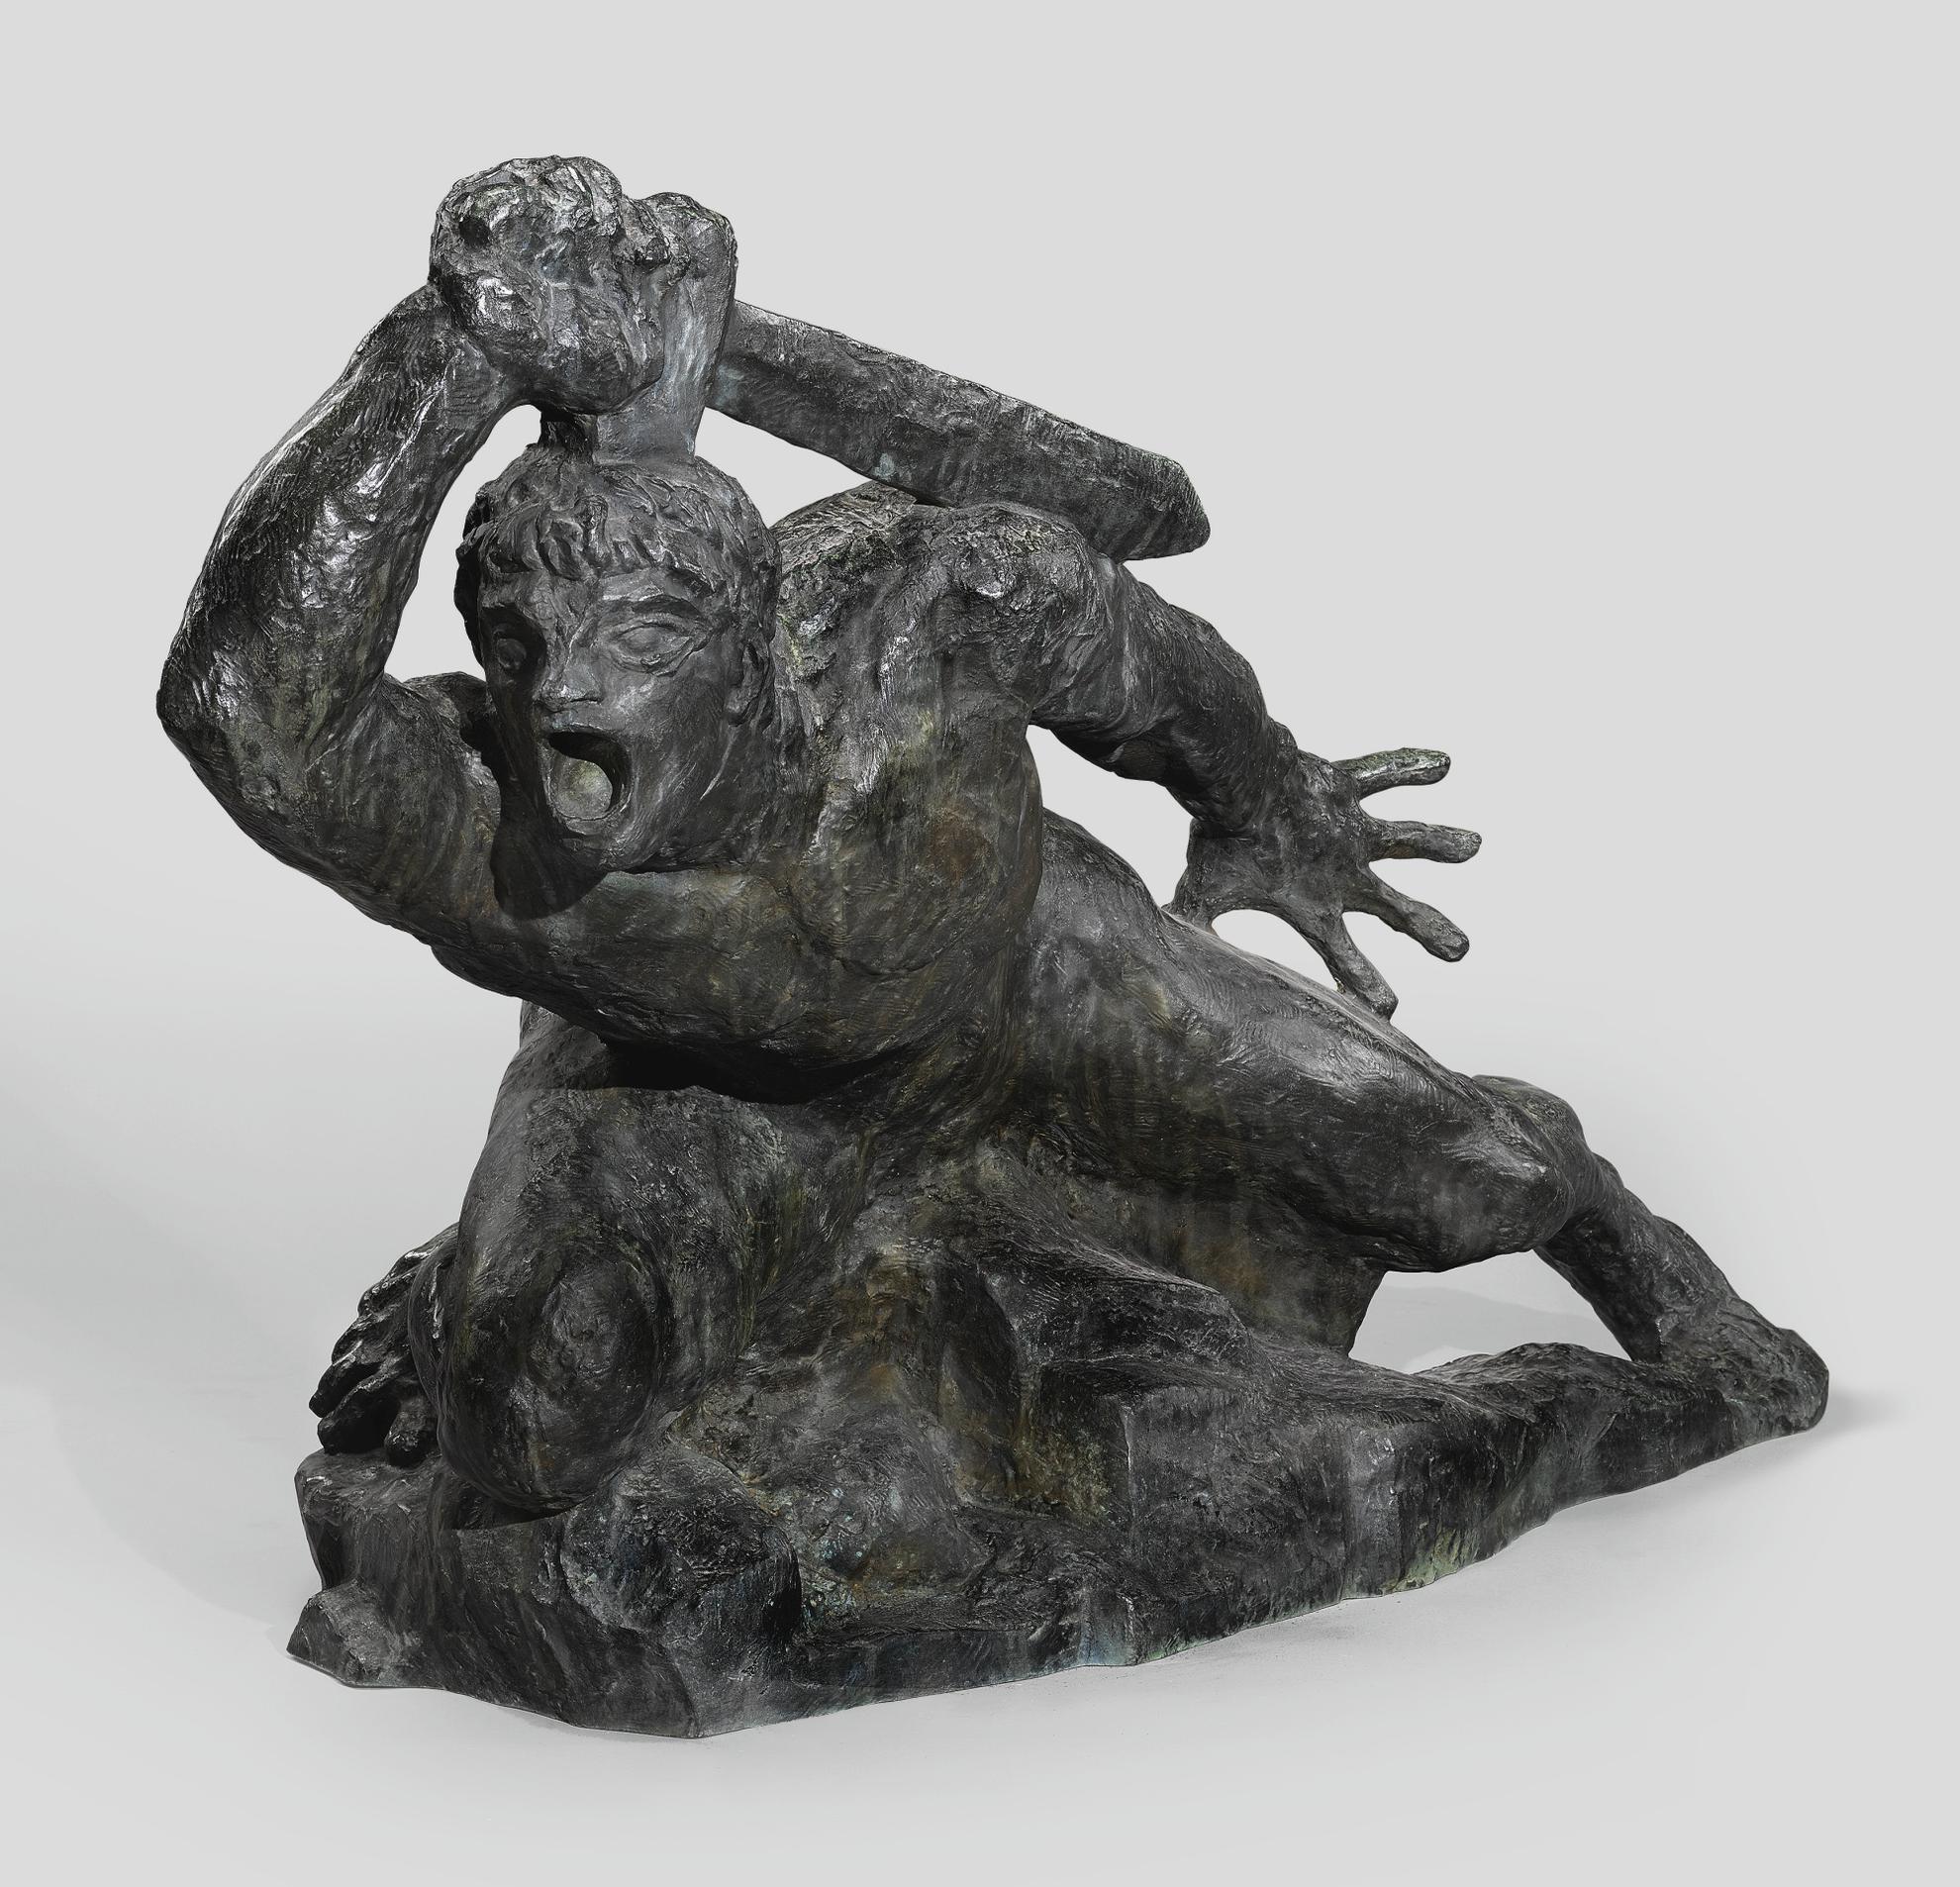 Emile Antoine Bourdelle - Guerrier Allonge Au Glaive, Grand Modele-1898